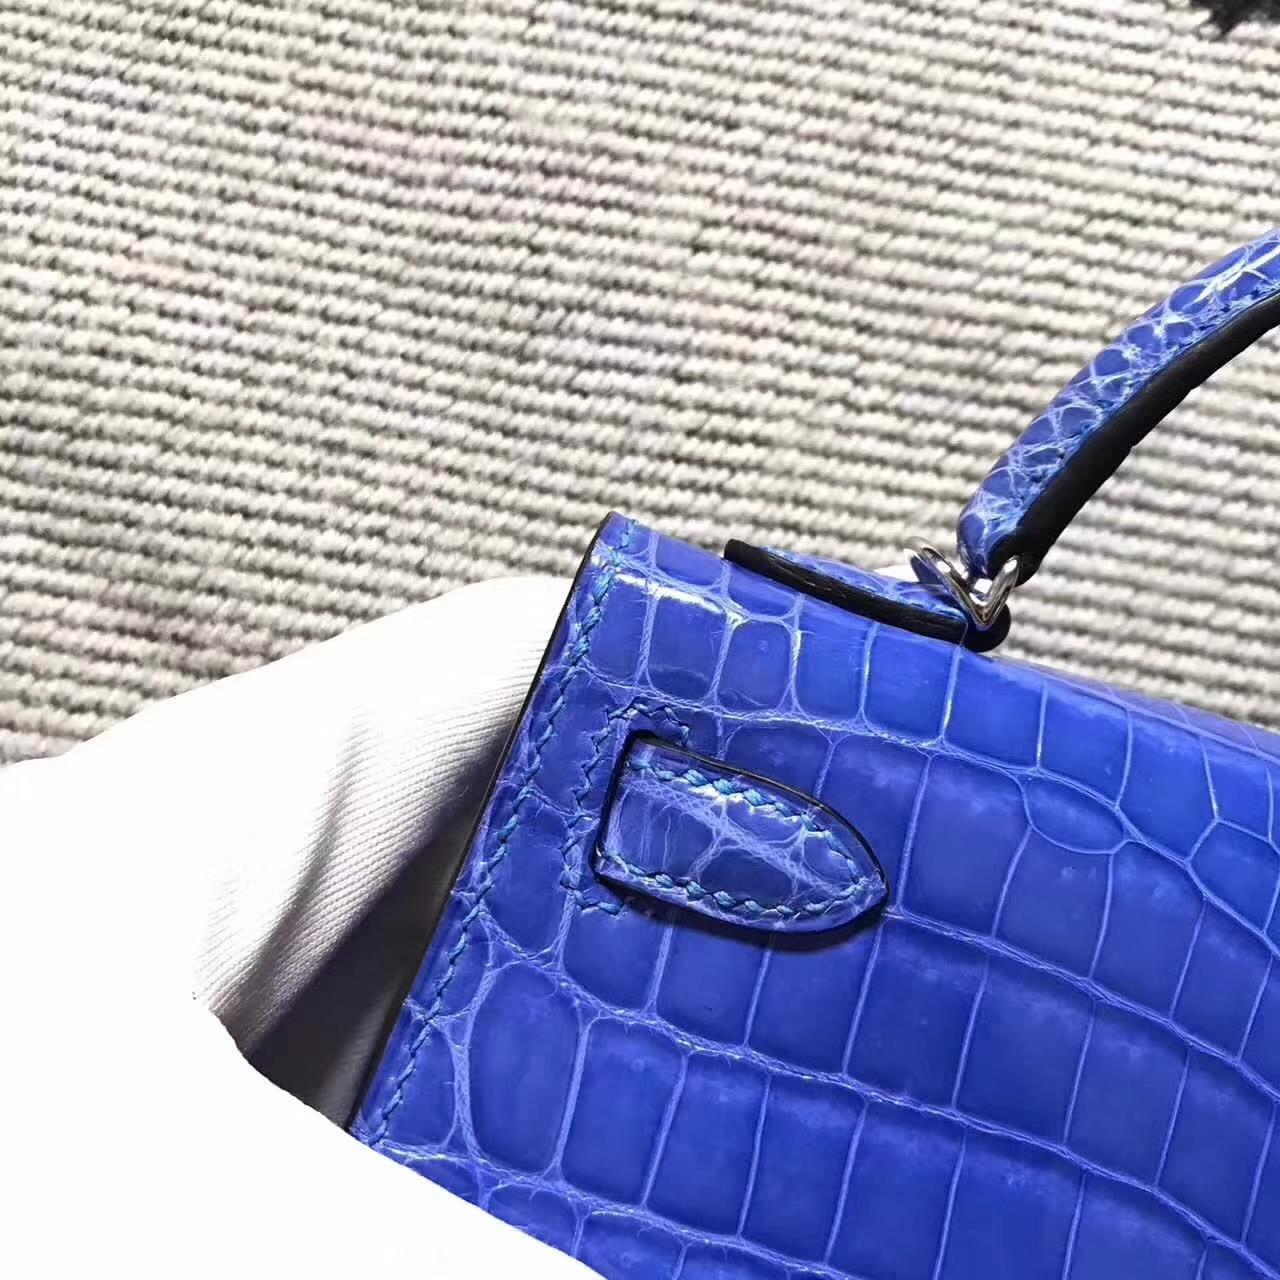 Cheap Hermes Blue Izmir  Crocodile ShinyLeather Minikelly-2 Clutch Bag